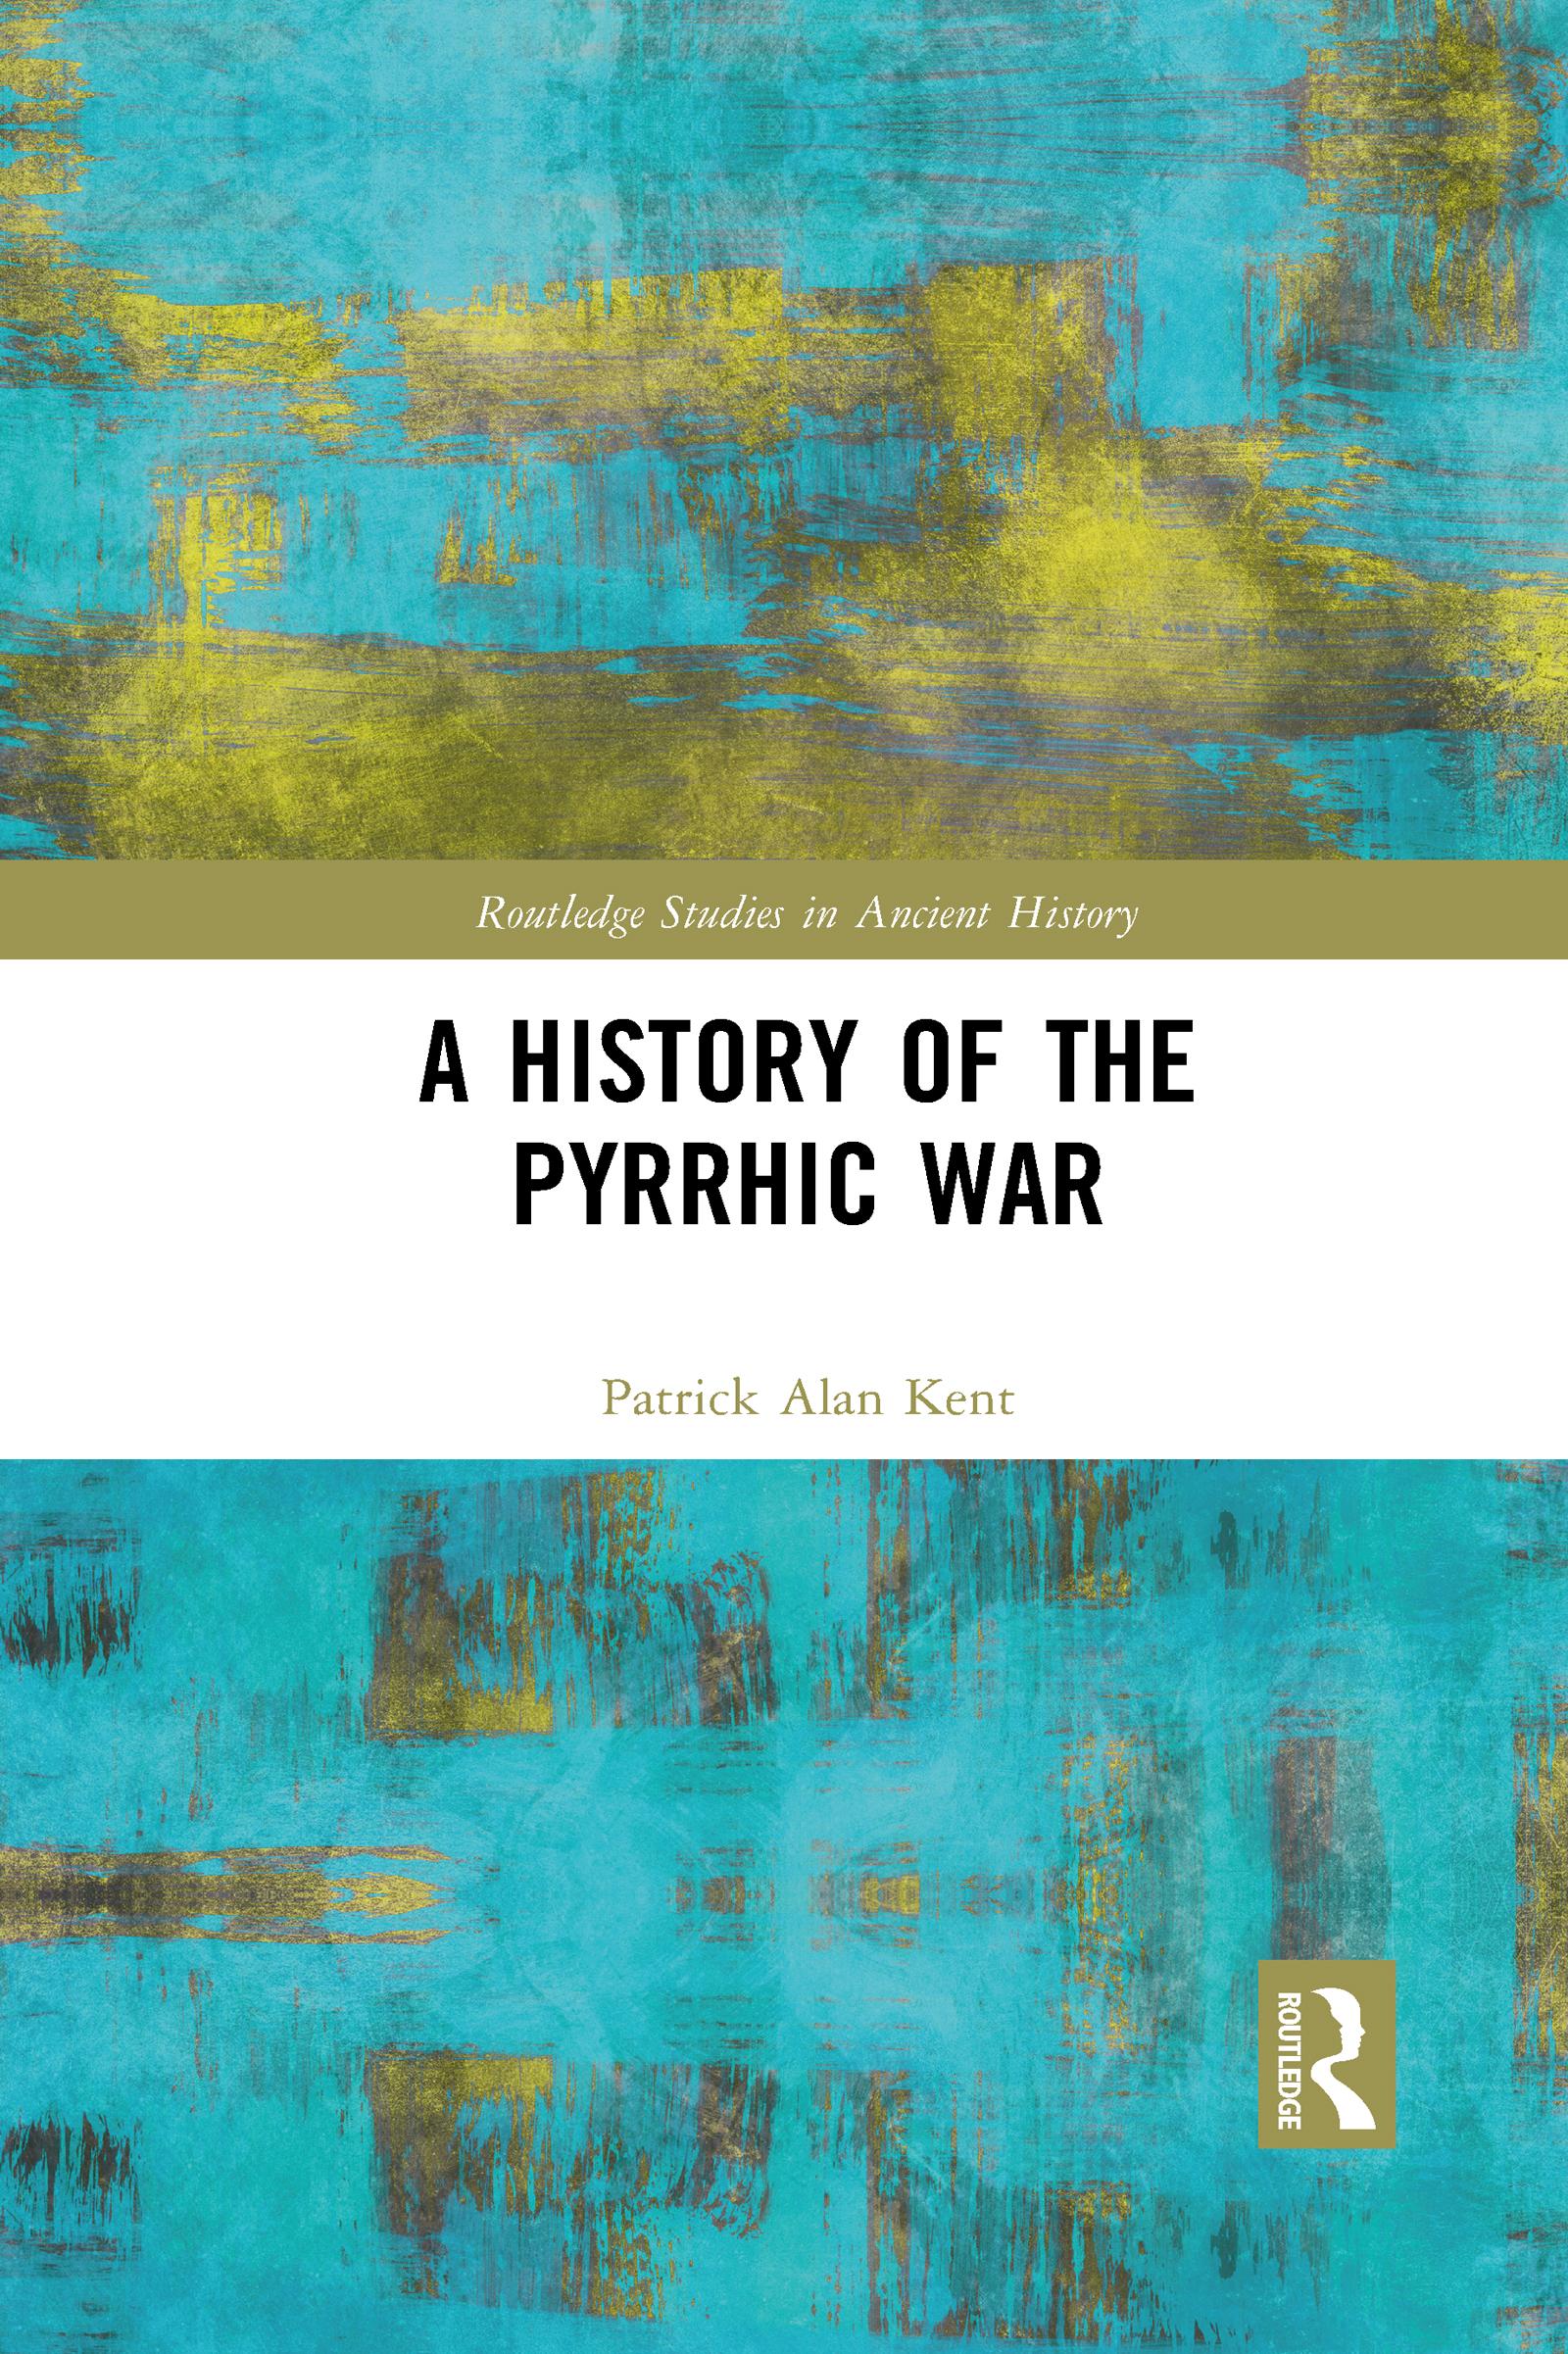 A History of the Pyrrhic War